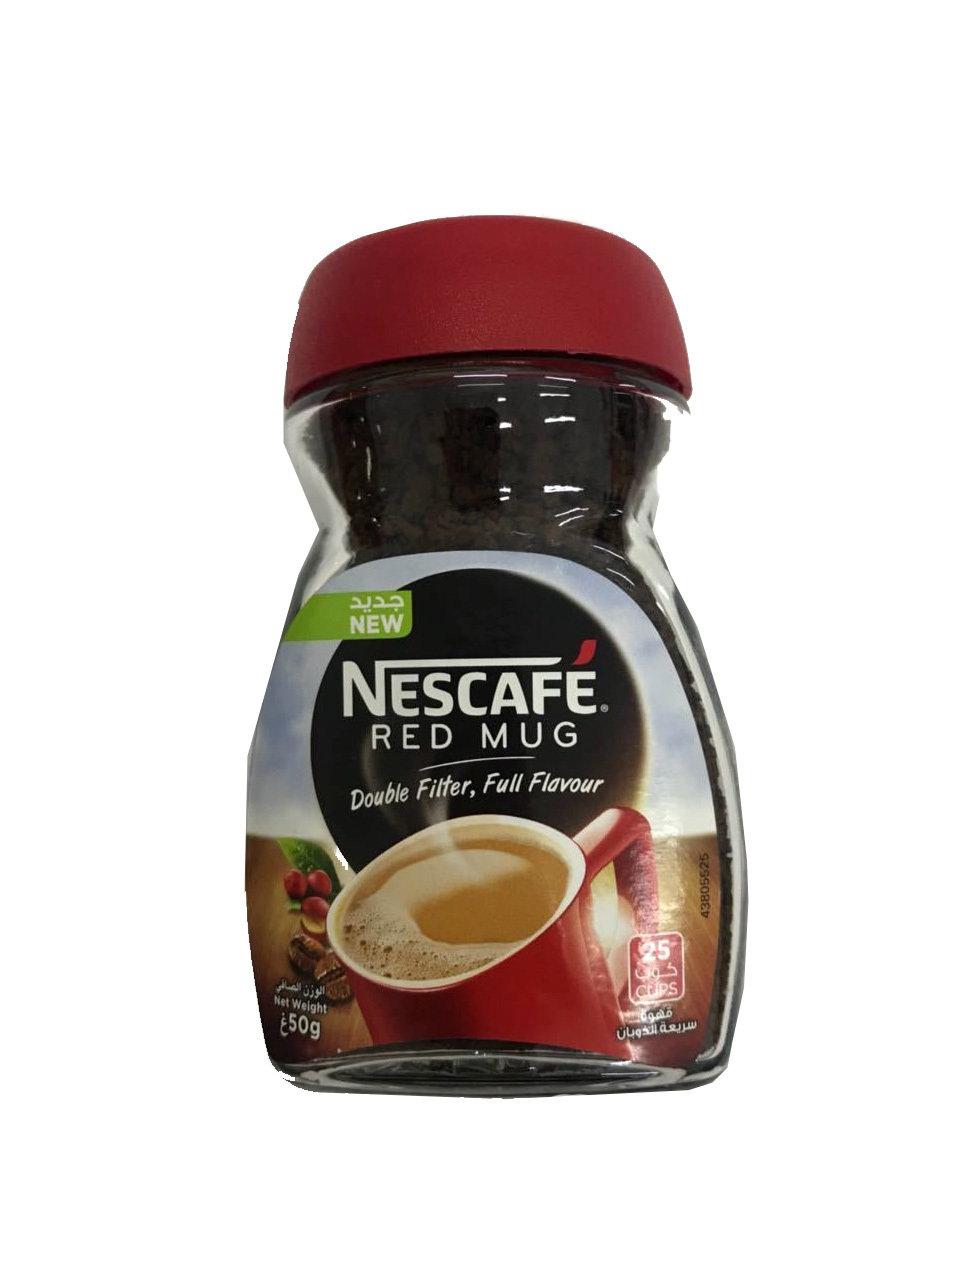 Nescafe Double Filter, Full Flavor 50g